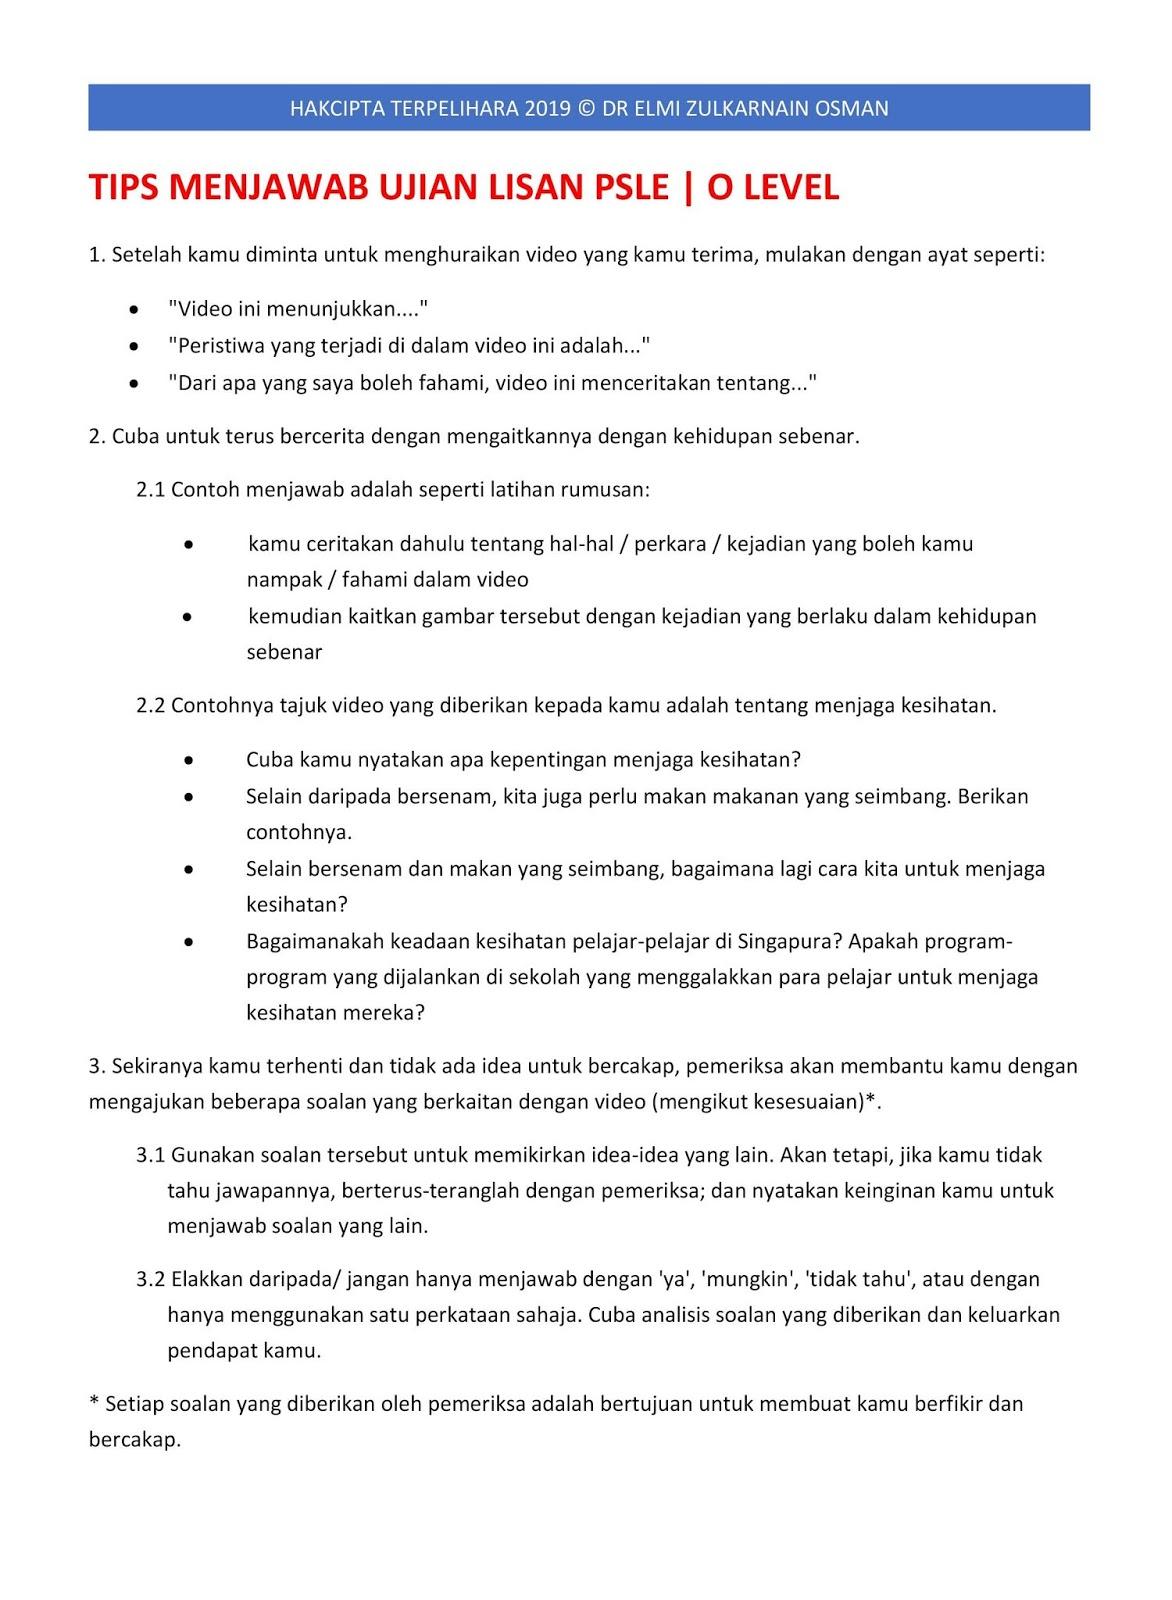 Malay Language Tuition Malay Tutor Malay Tuition Singapore